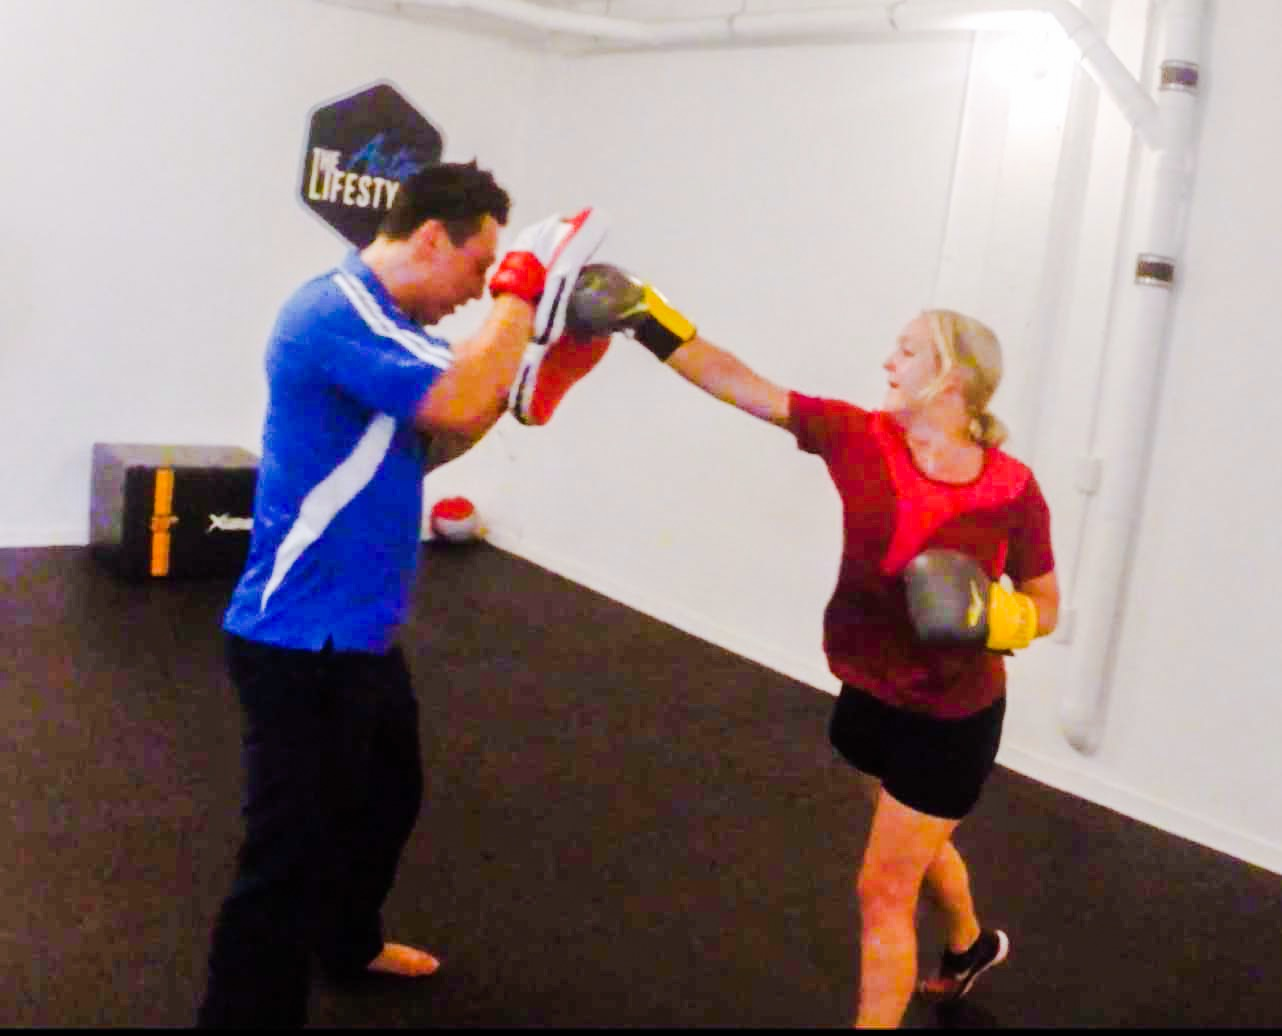 boxing-bron-punch2-small.JPG